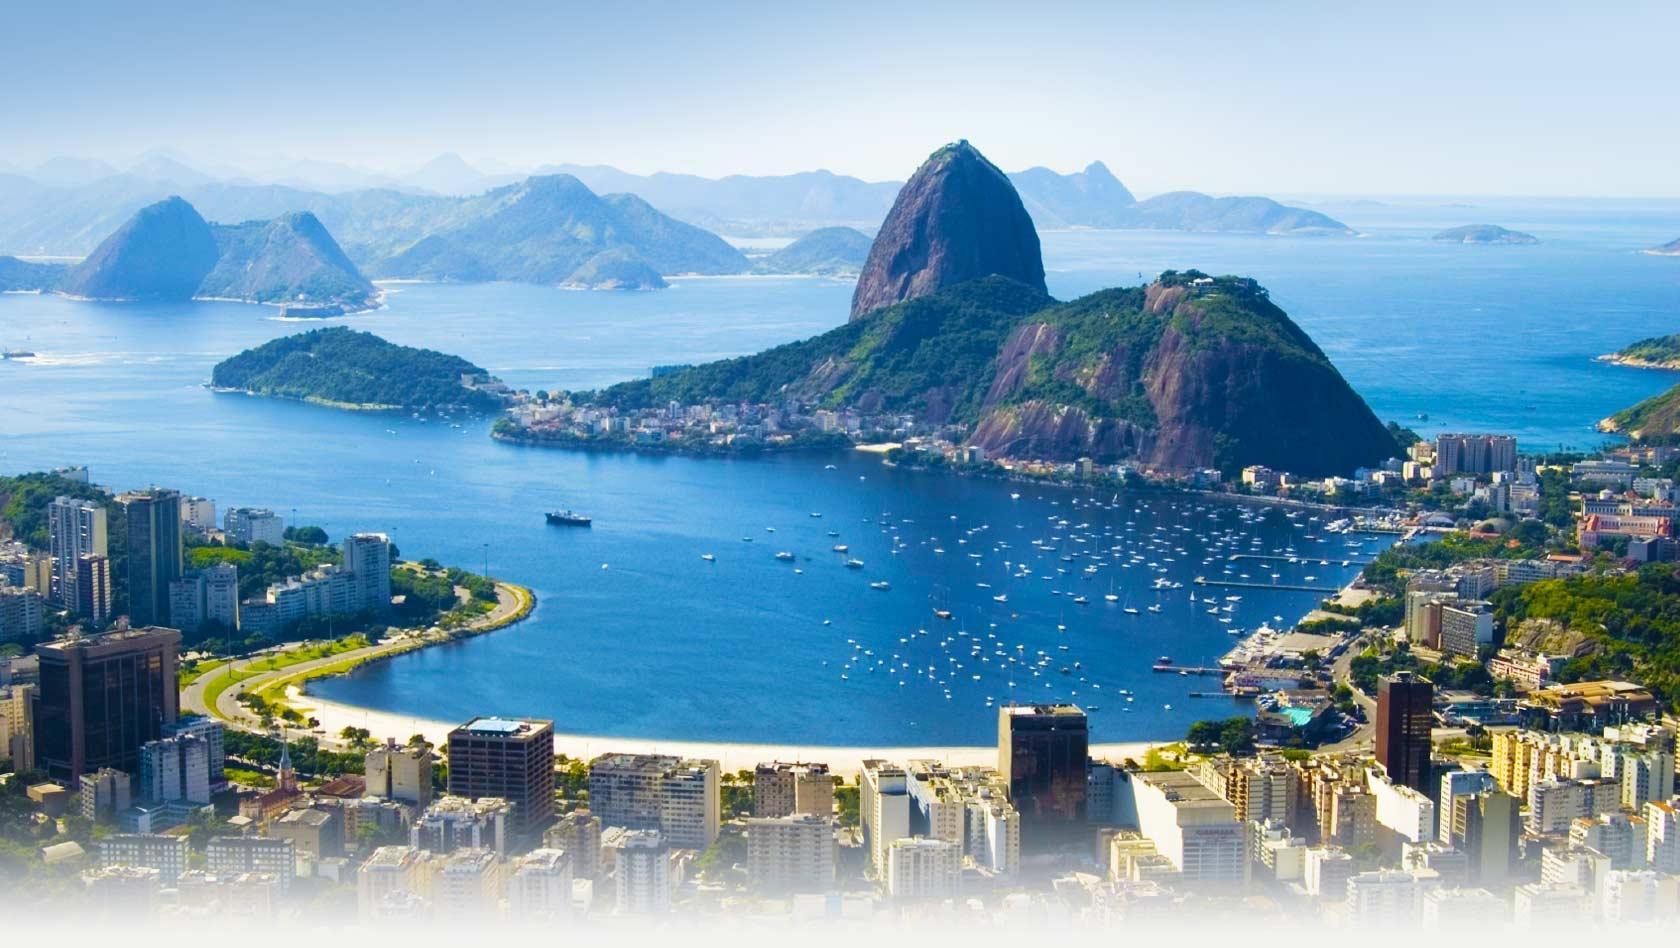 Botafogo Bay, Rio de Janeiro - Brazil